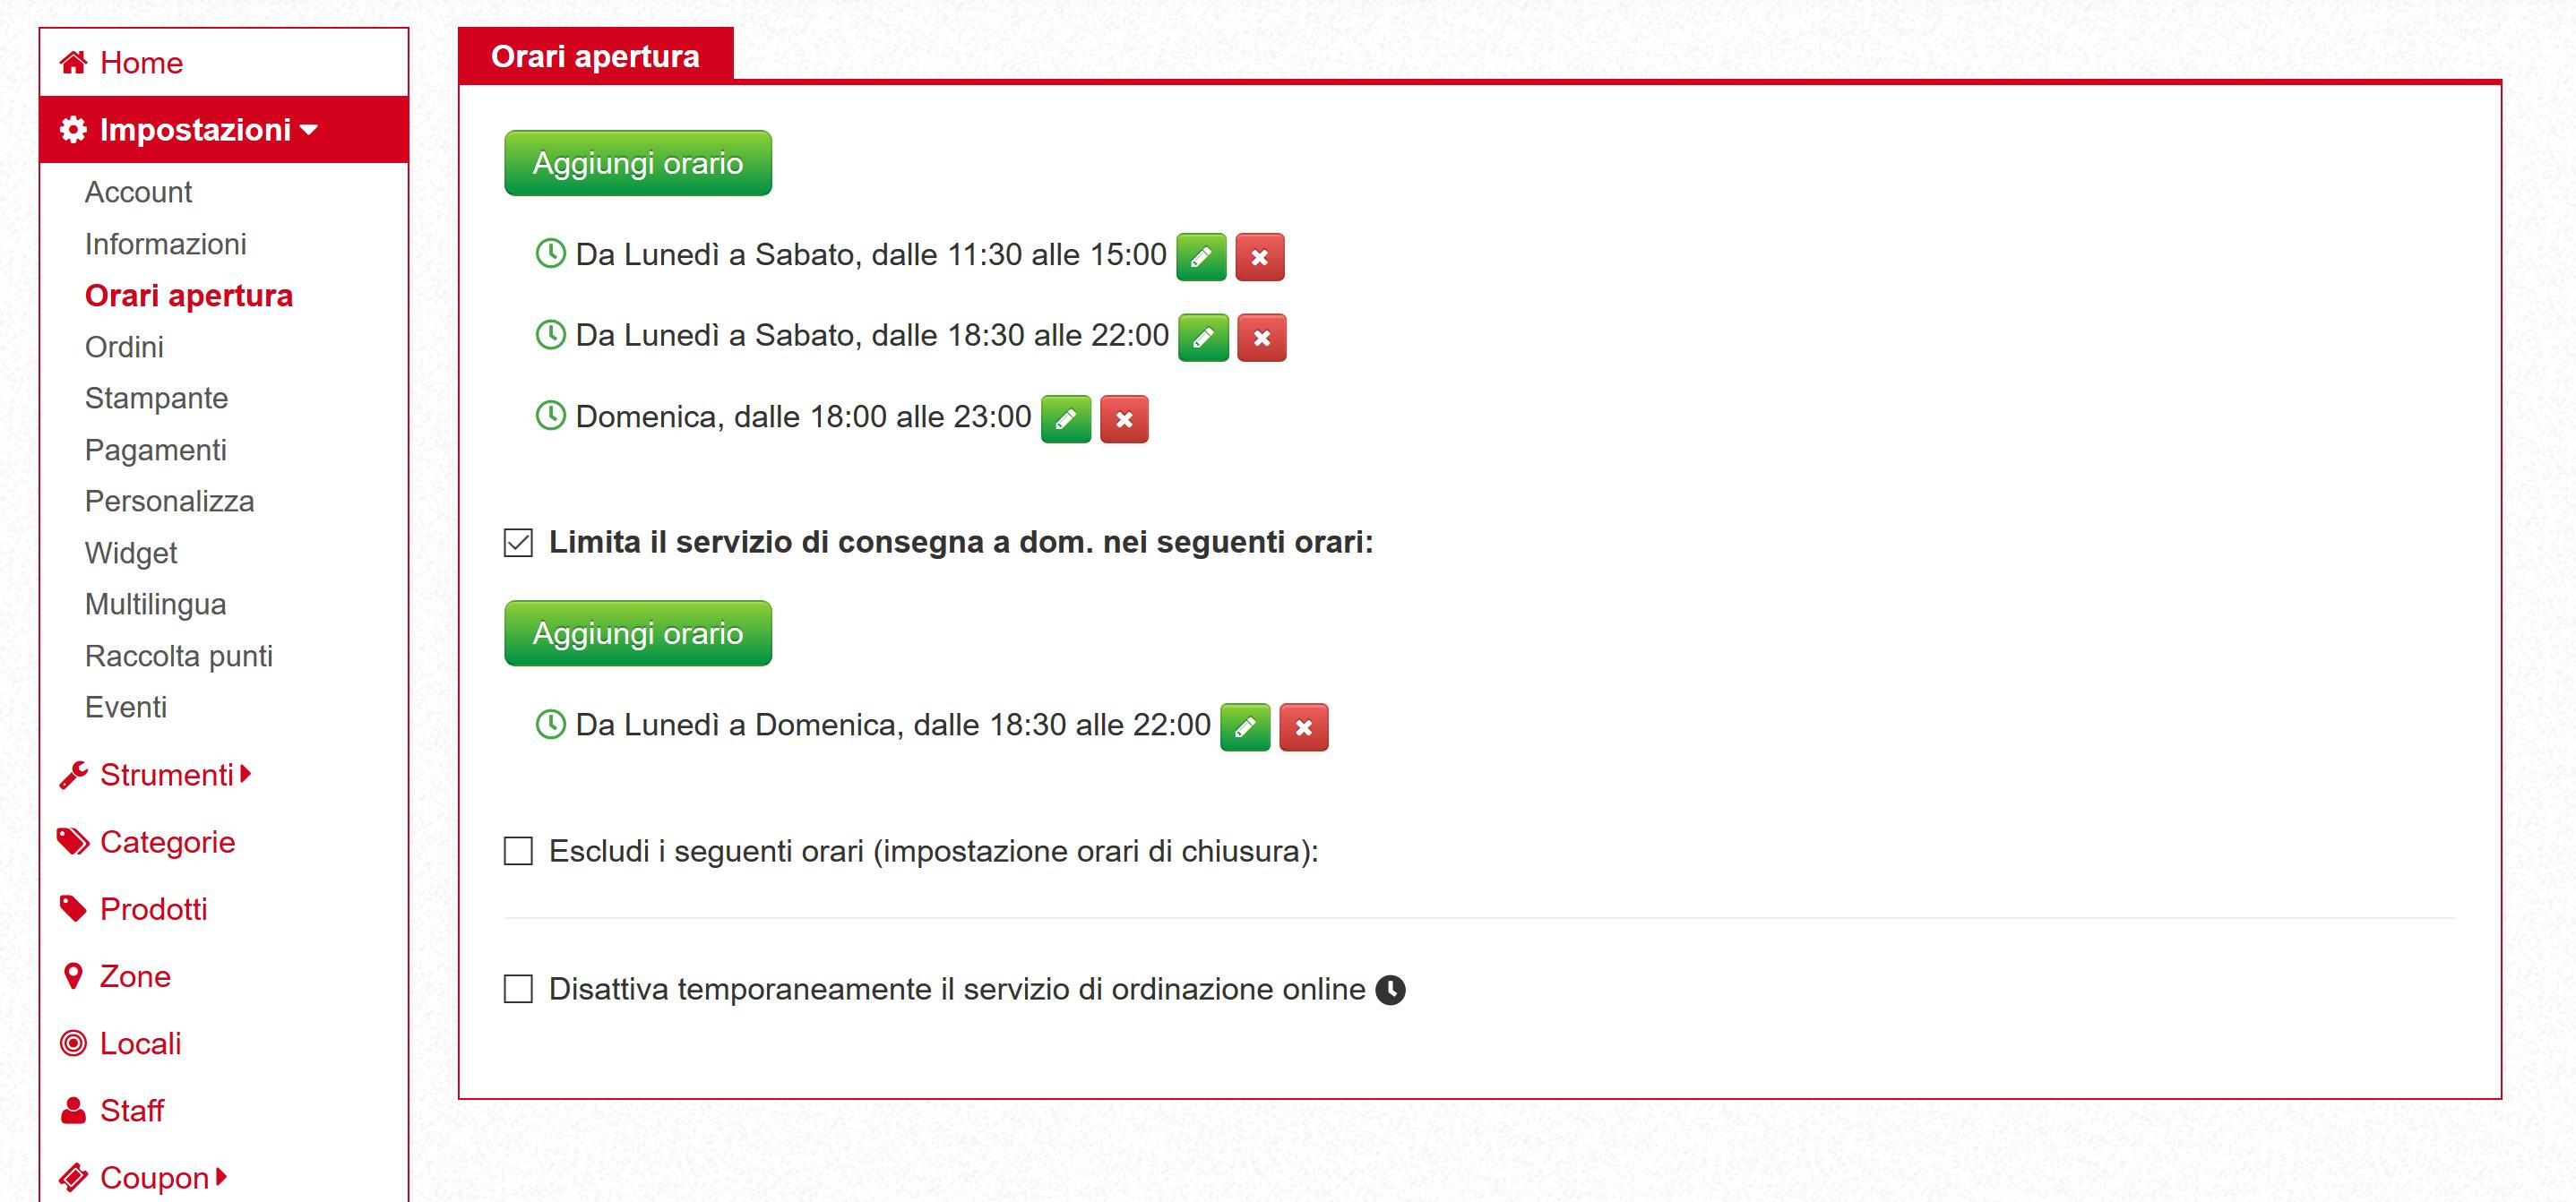 Firefox_Screenshot_2020-01-09T15-53-20.311Z